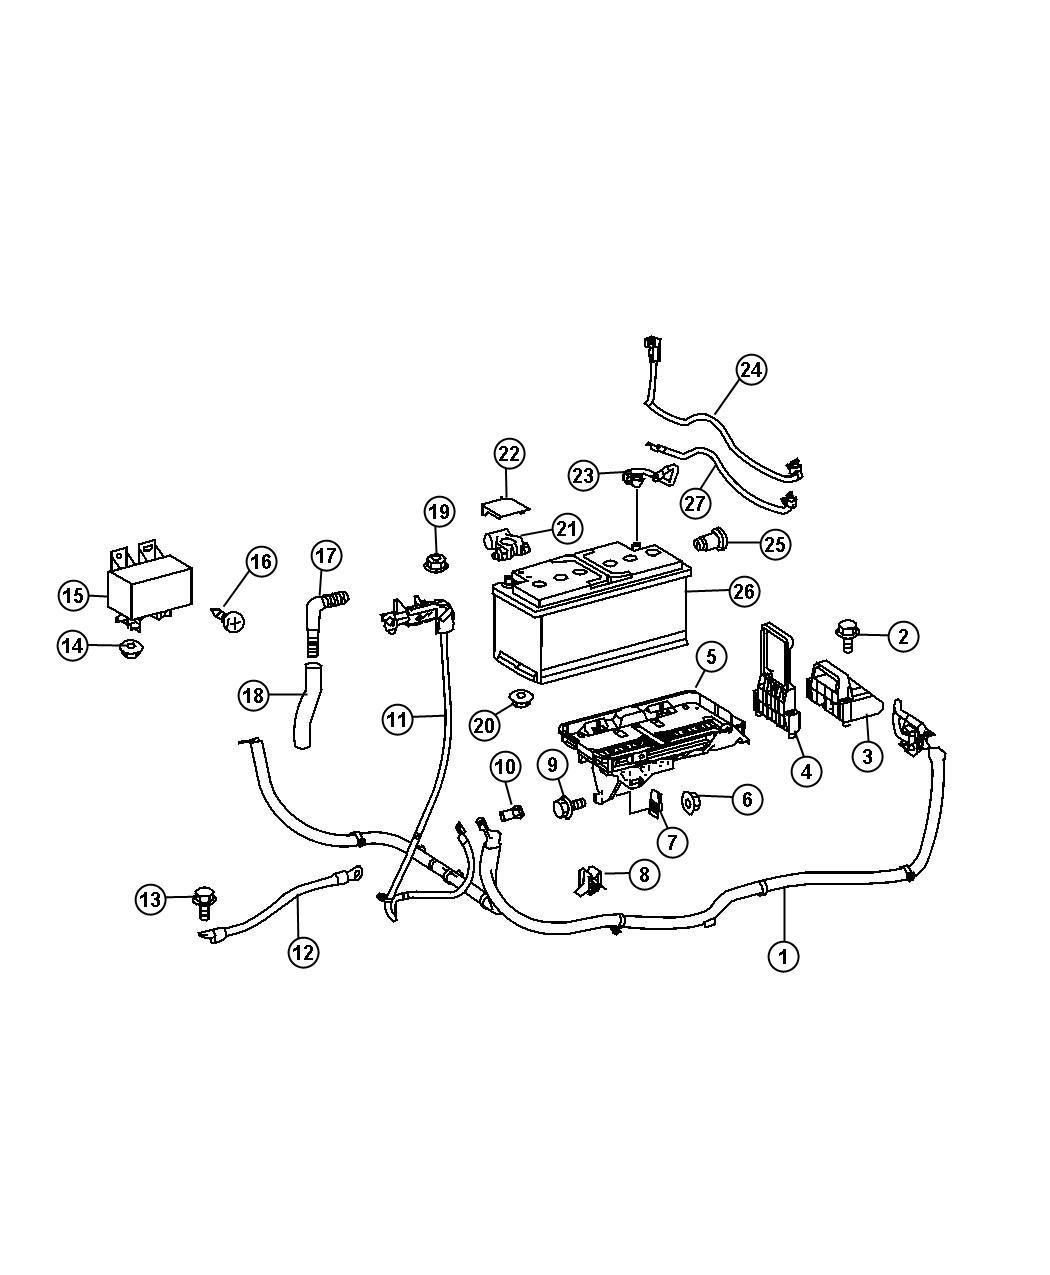 Dodge Sprinter Auxilary Battery Tray